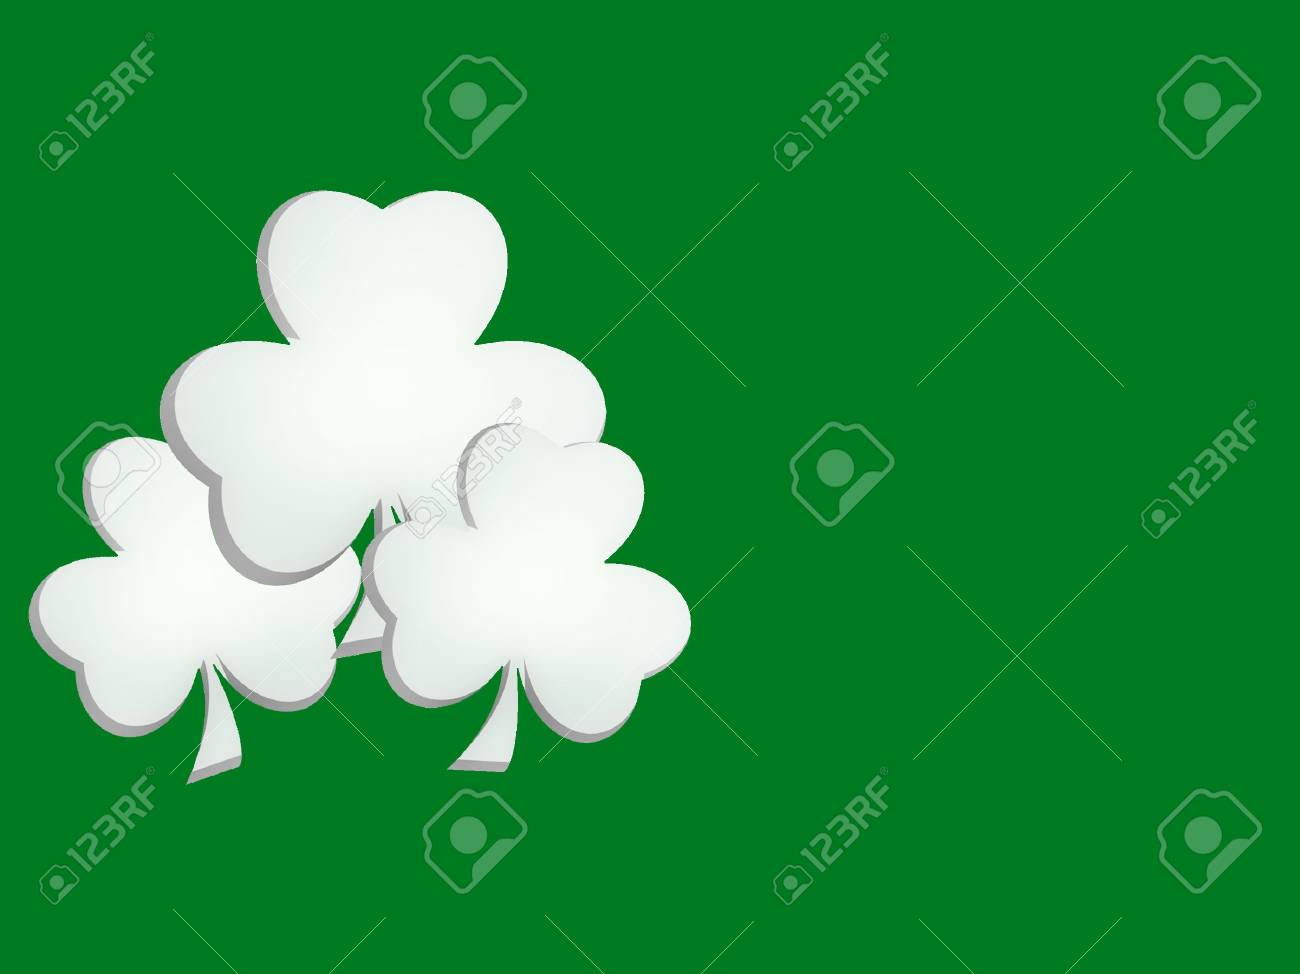 Three Lucky Shamrocks on Green Background Stock Photo - 798589